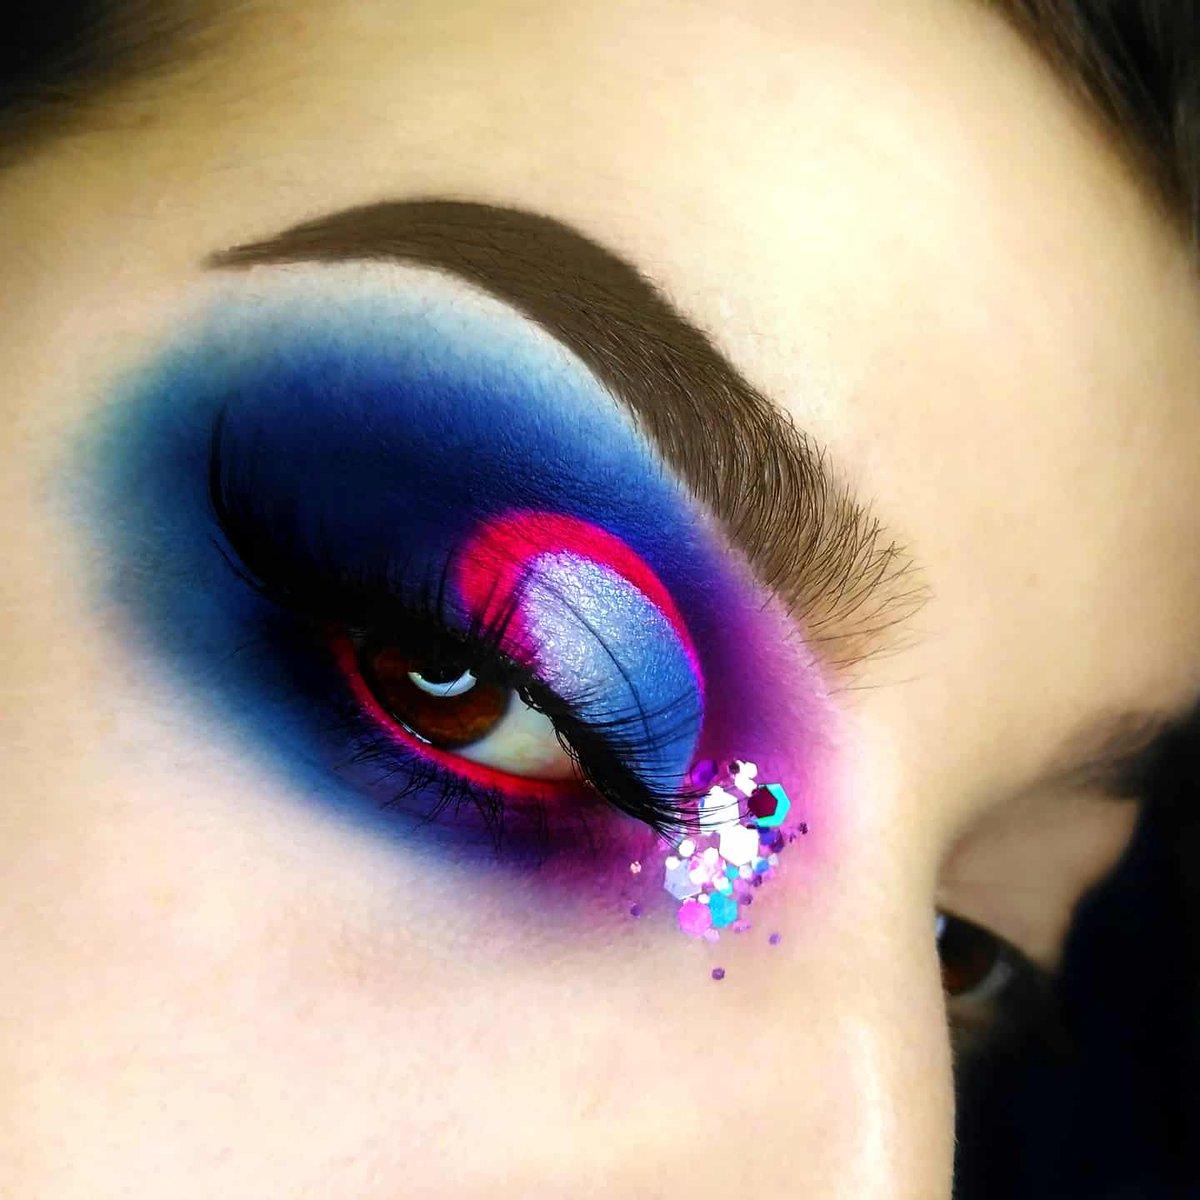 @ColourPopCo Blue moon palette @bperfectcosm Carnival xl Pro palette @Laroc_Cosmetics Pro Artistry book @plouise14 base 0.5 @JeffreeStar Artistry palette @MorpheBrushes x @jamescharles Artistry palette #morphebabe #JeffreeStarCosmetics #jeffreestarprlist #colourpopgivesbackpic.twitter.com/WFx1flIRuu